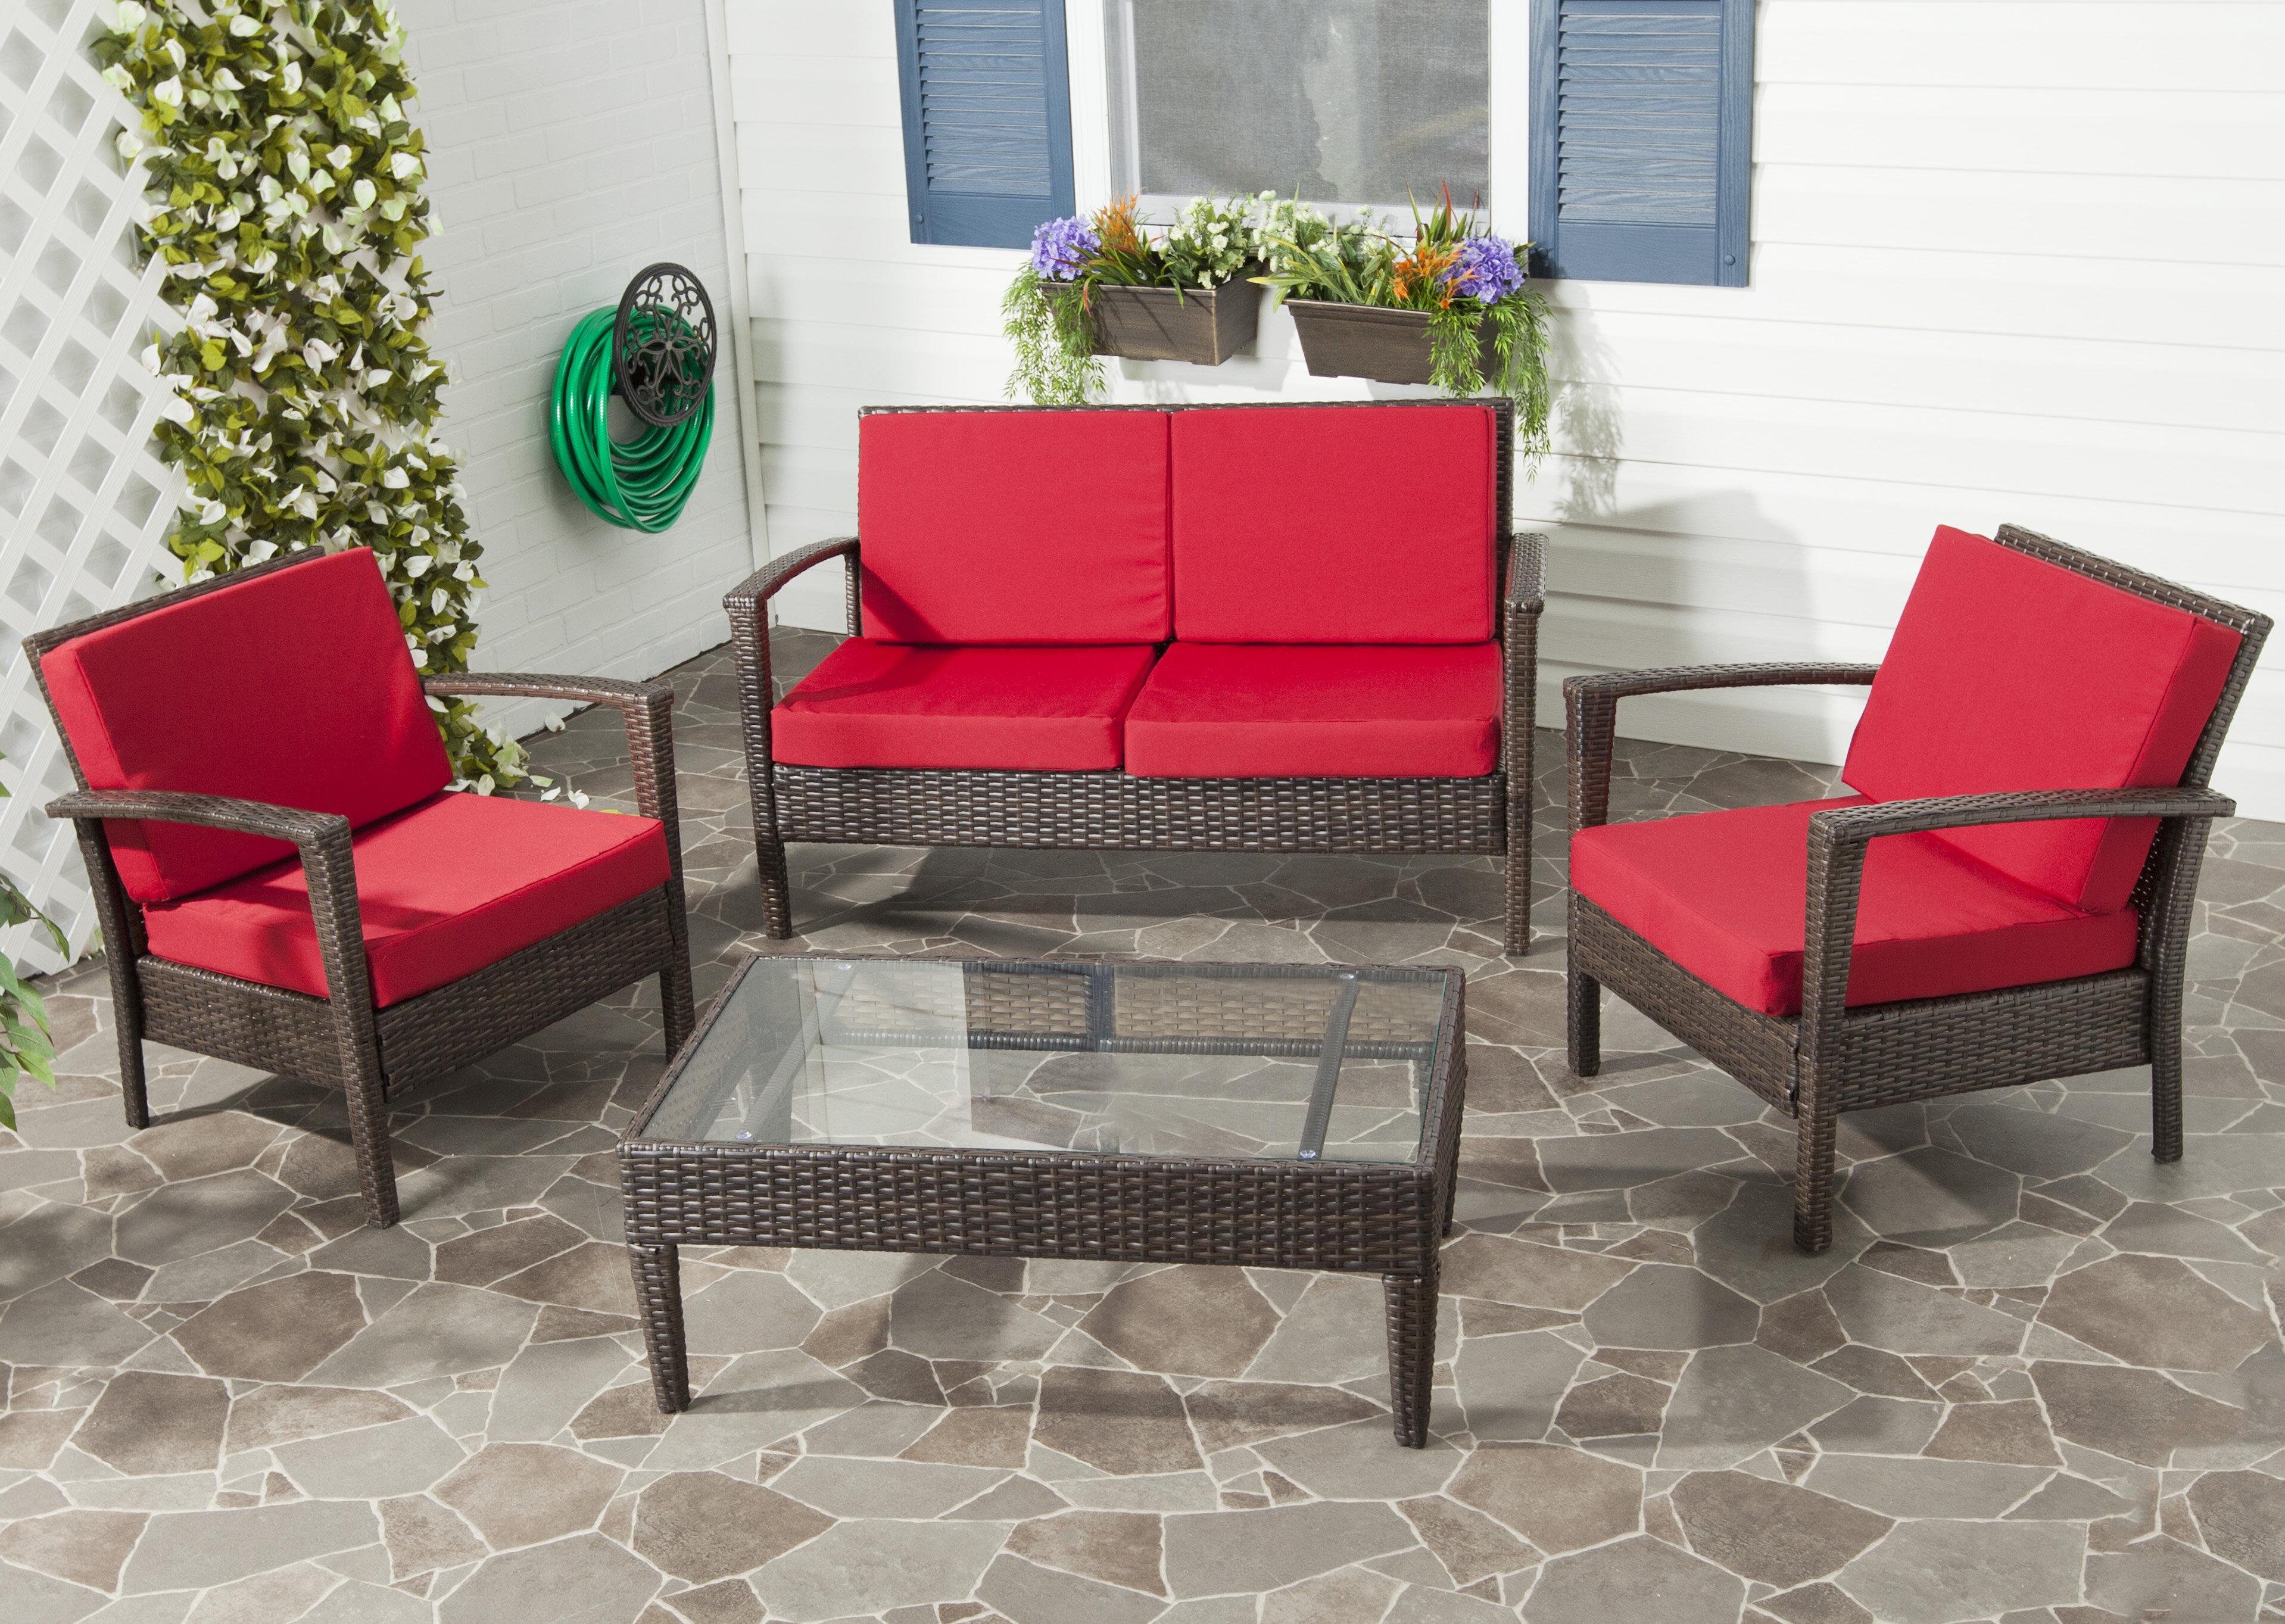 Cade 4 Piece Rattan Sofa Set with Cushions